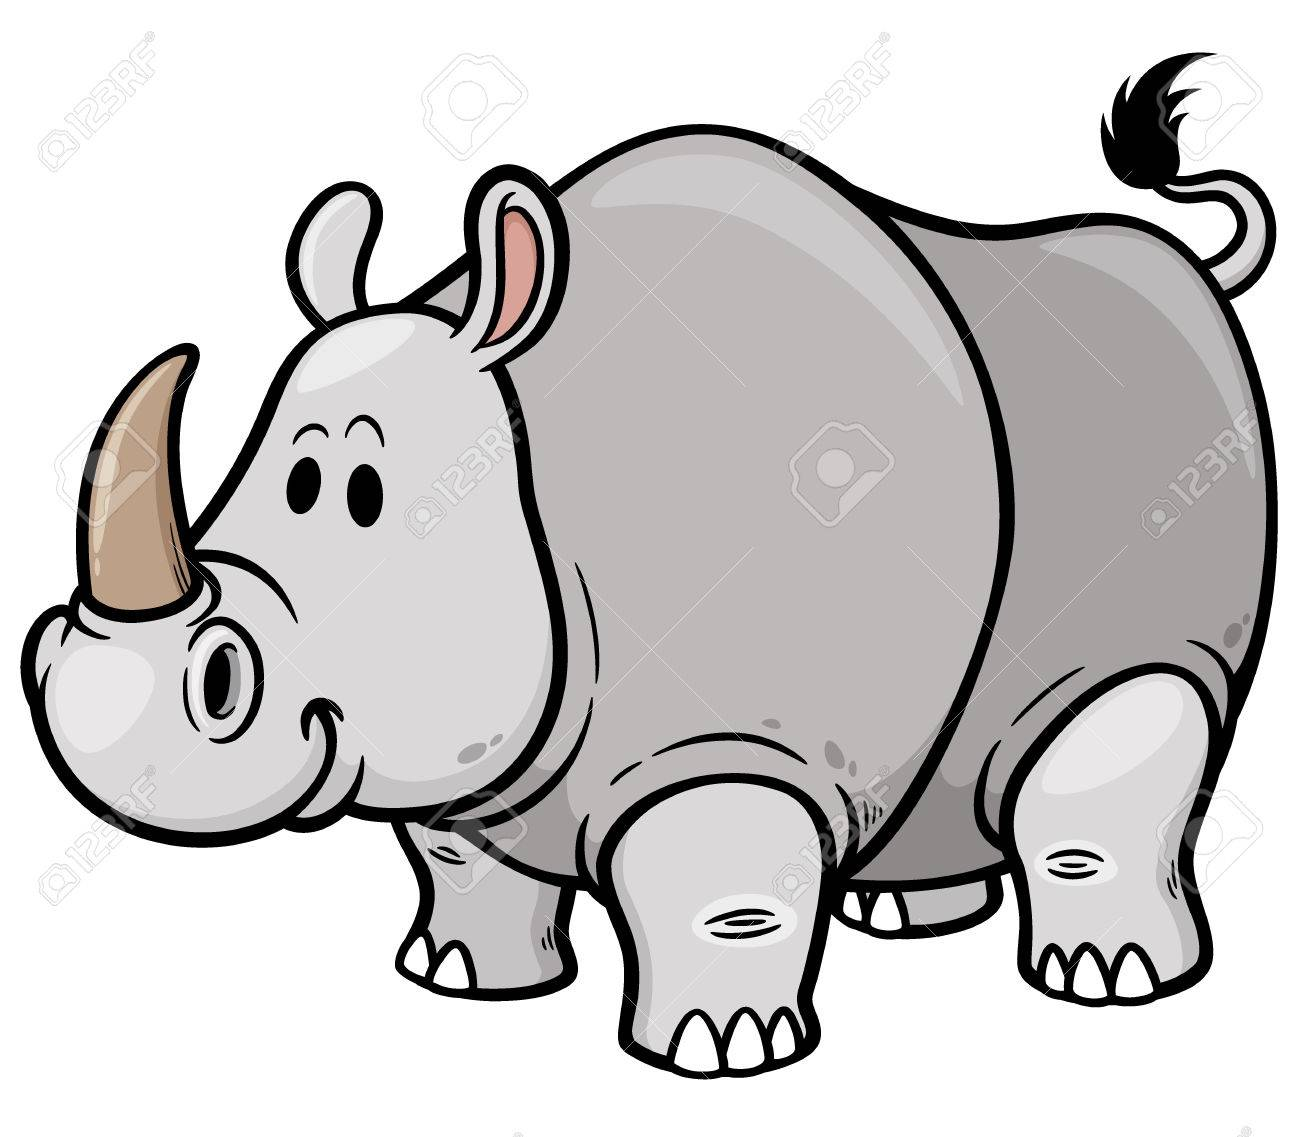 Vector illustration of Cartoon rhino.